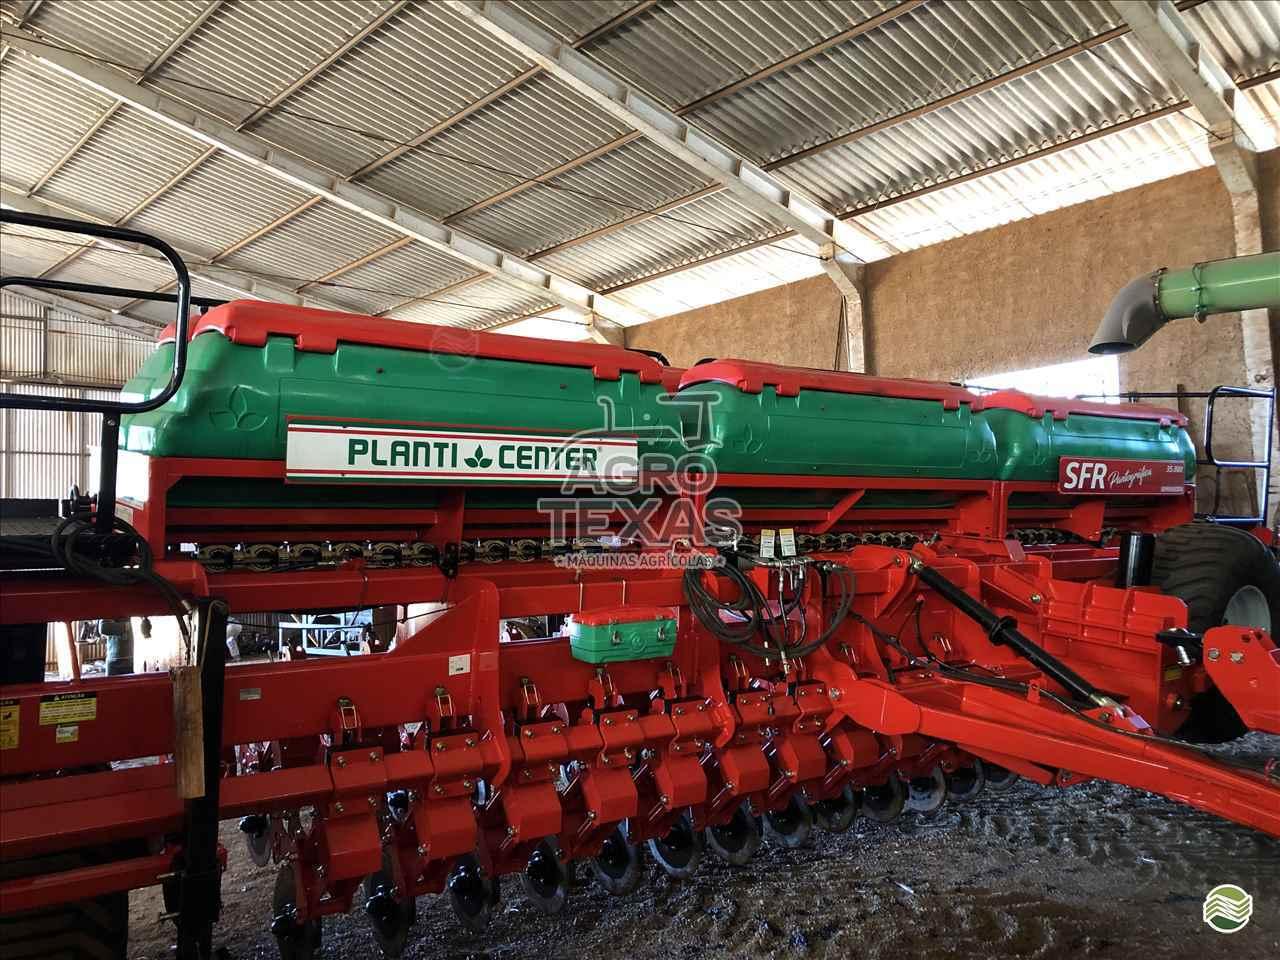 SEMEADEIRA PLANTI CENTER SFR 31000 Agro Texas Máquinas Agrícolas VITORINO PARANÁ PR